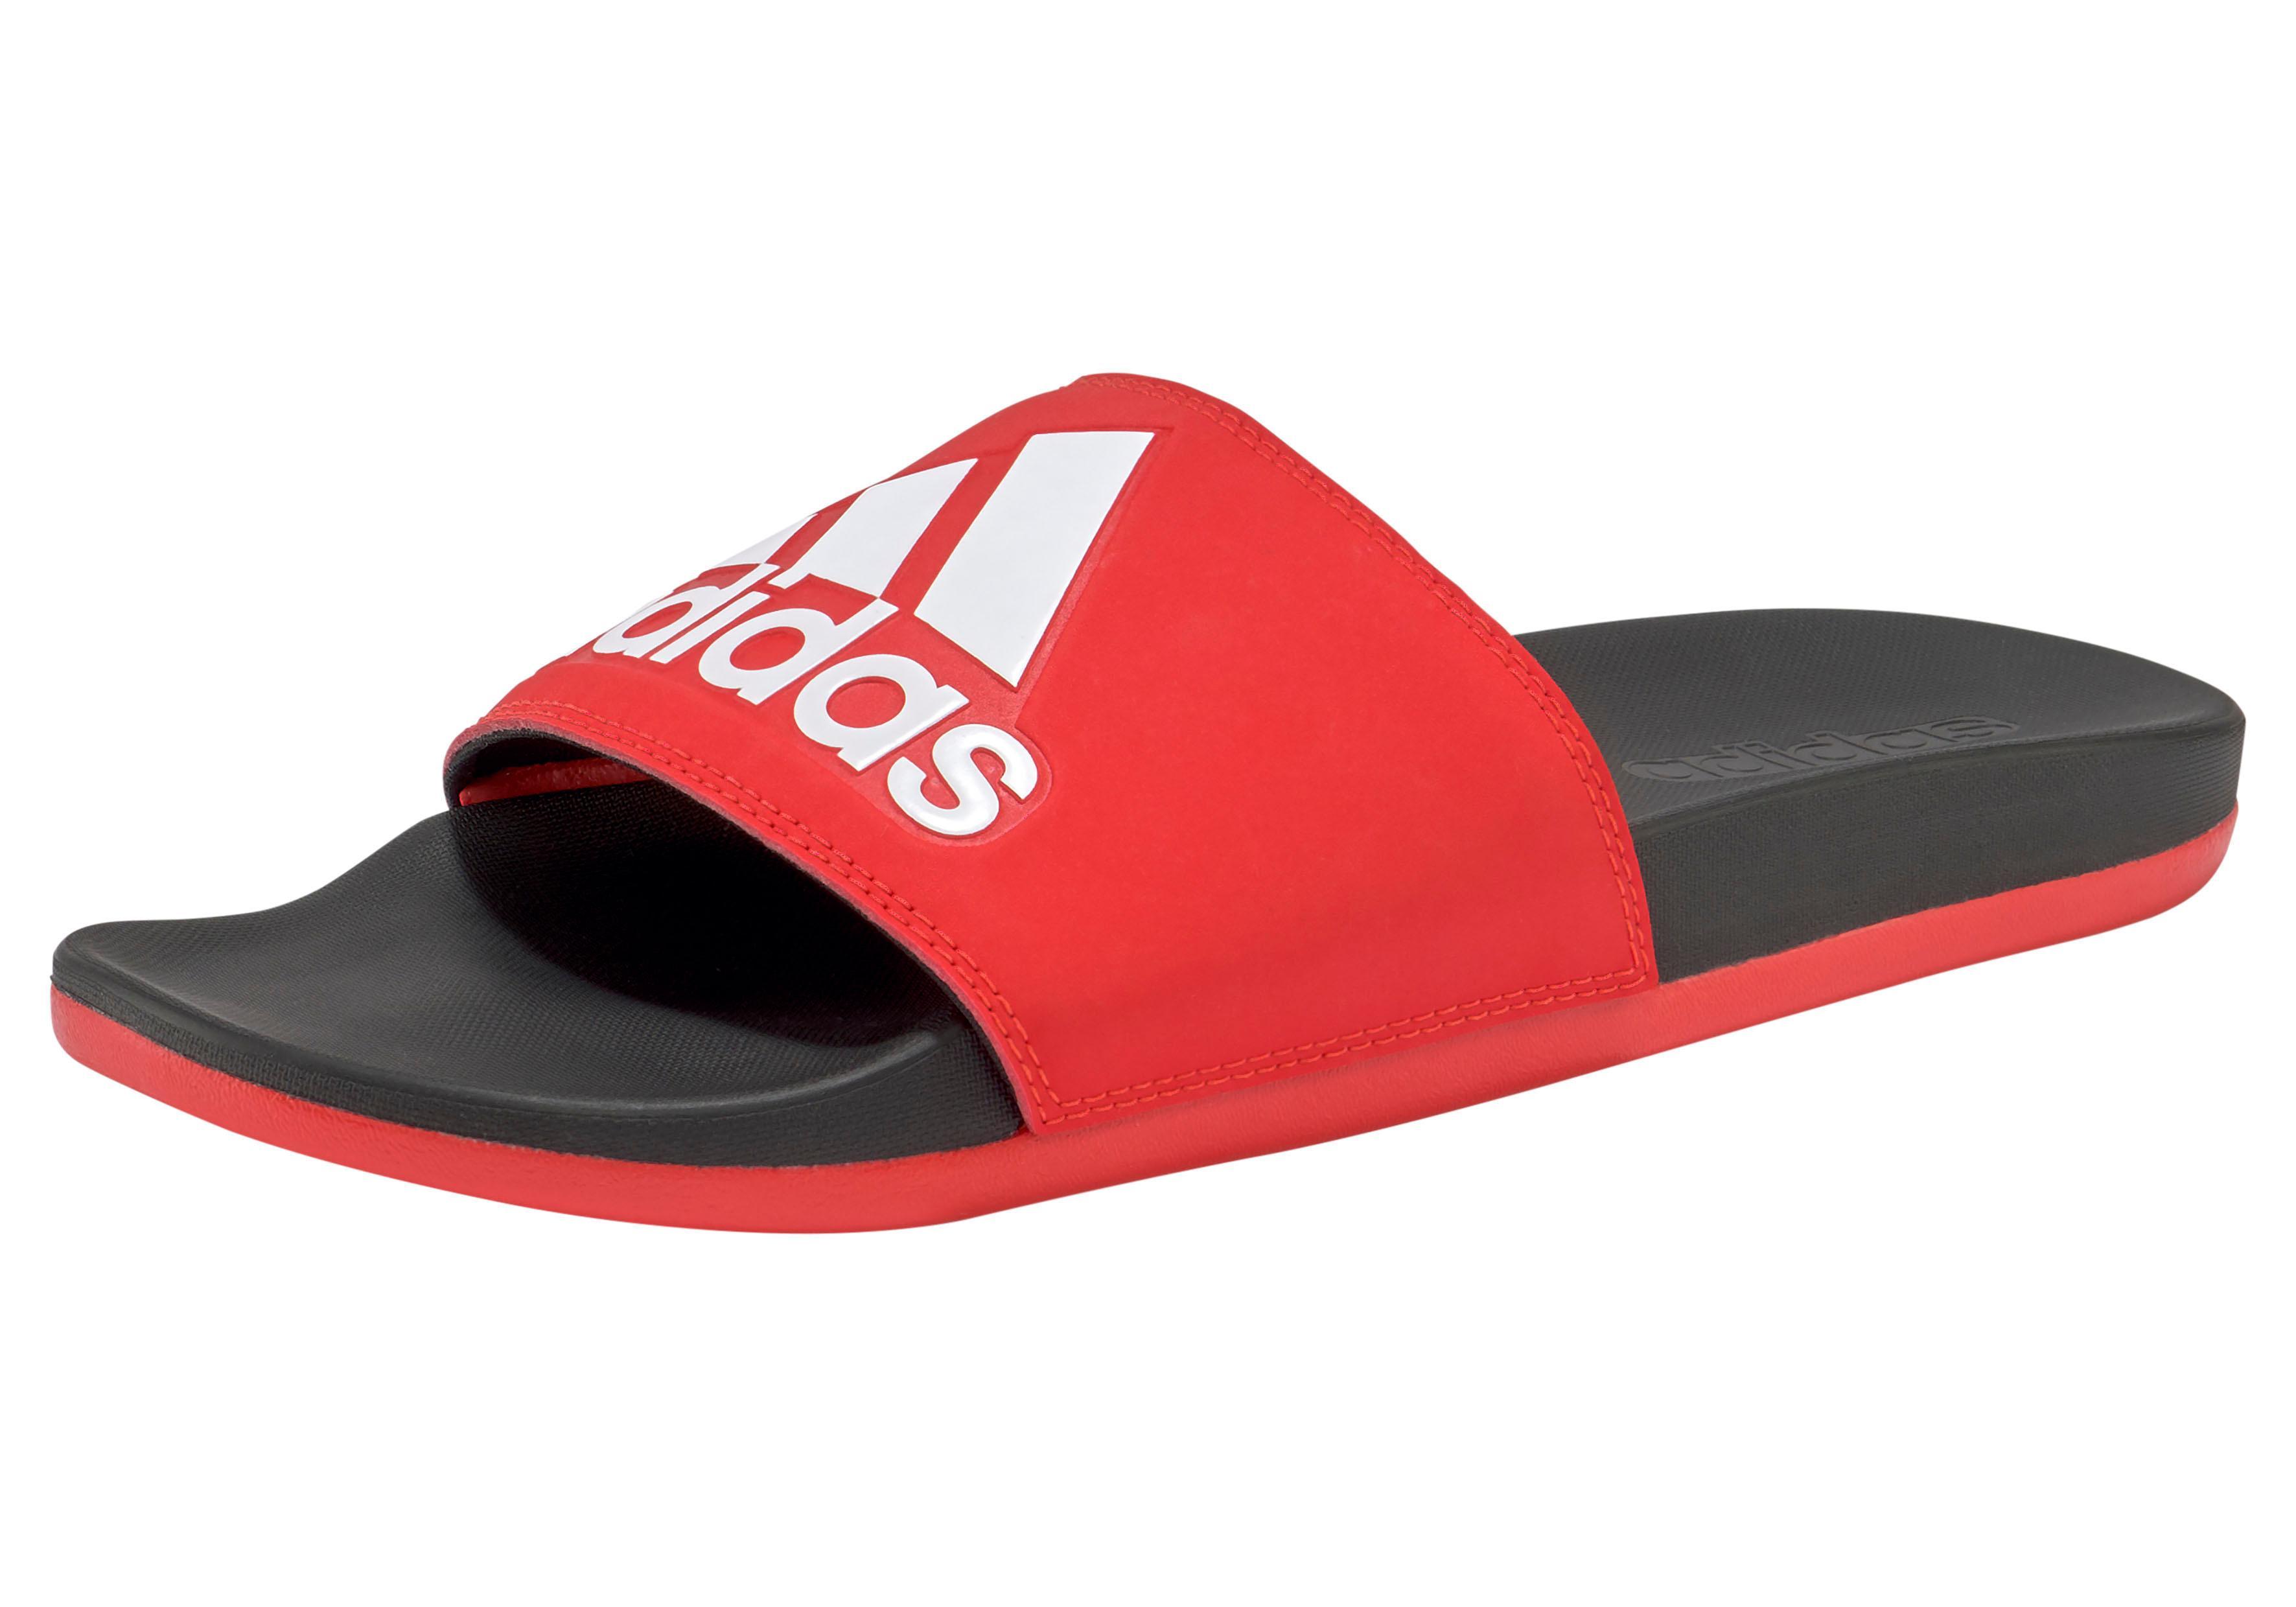 adidas Performance Badesandale Adilette Comfort rot Strandschuhe